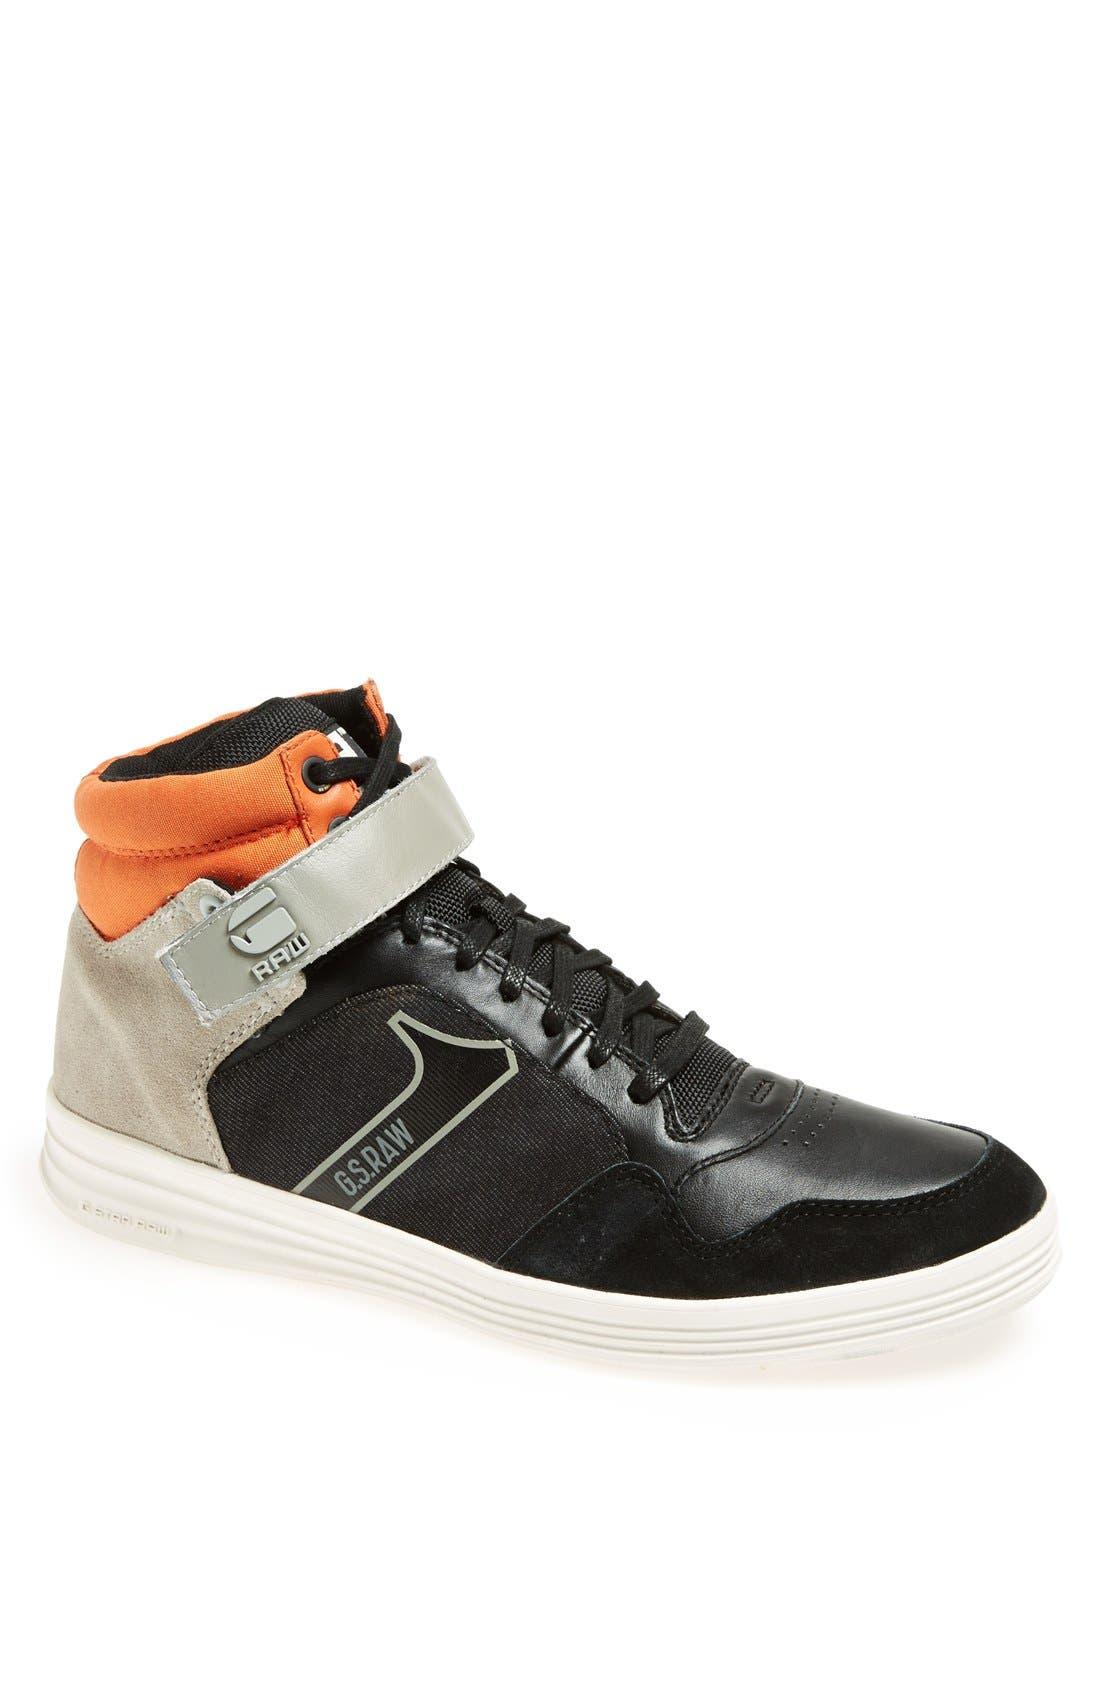 Alternate Image 1 Selected - G-Star Raw 'Futura Outland' Sneaker